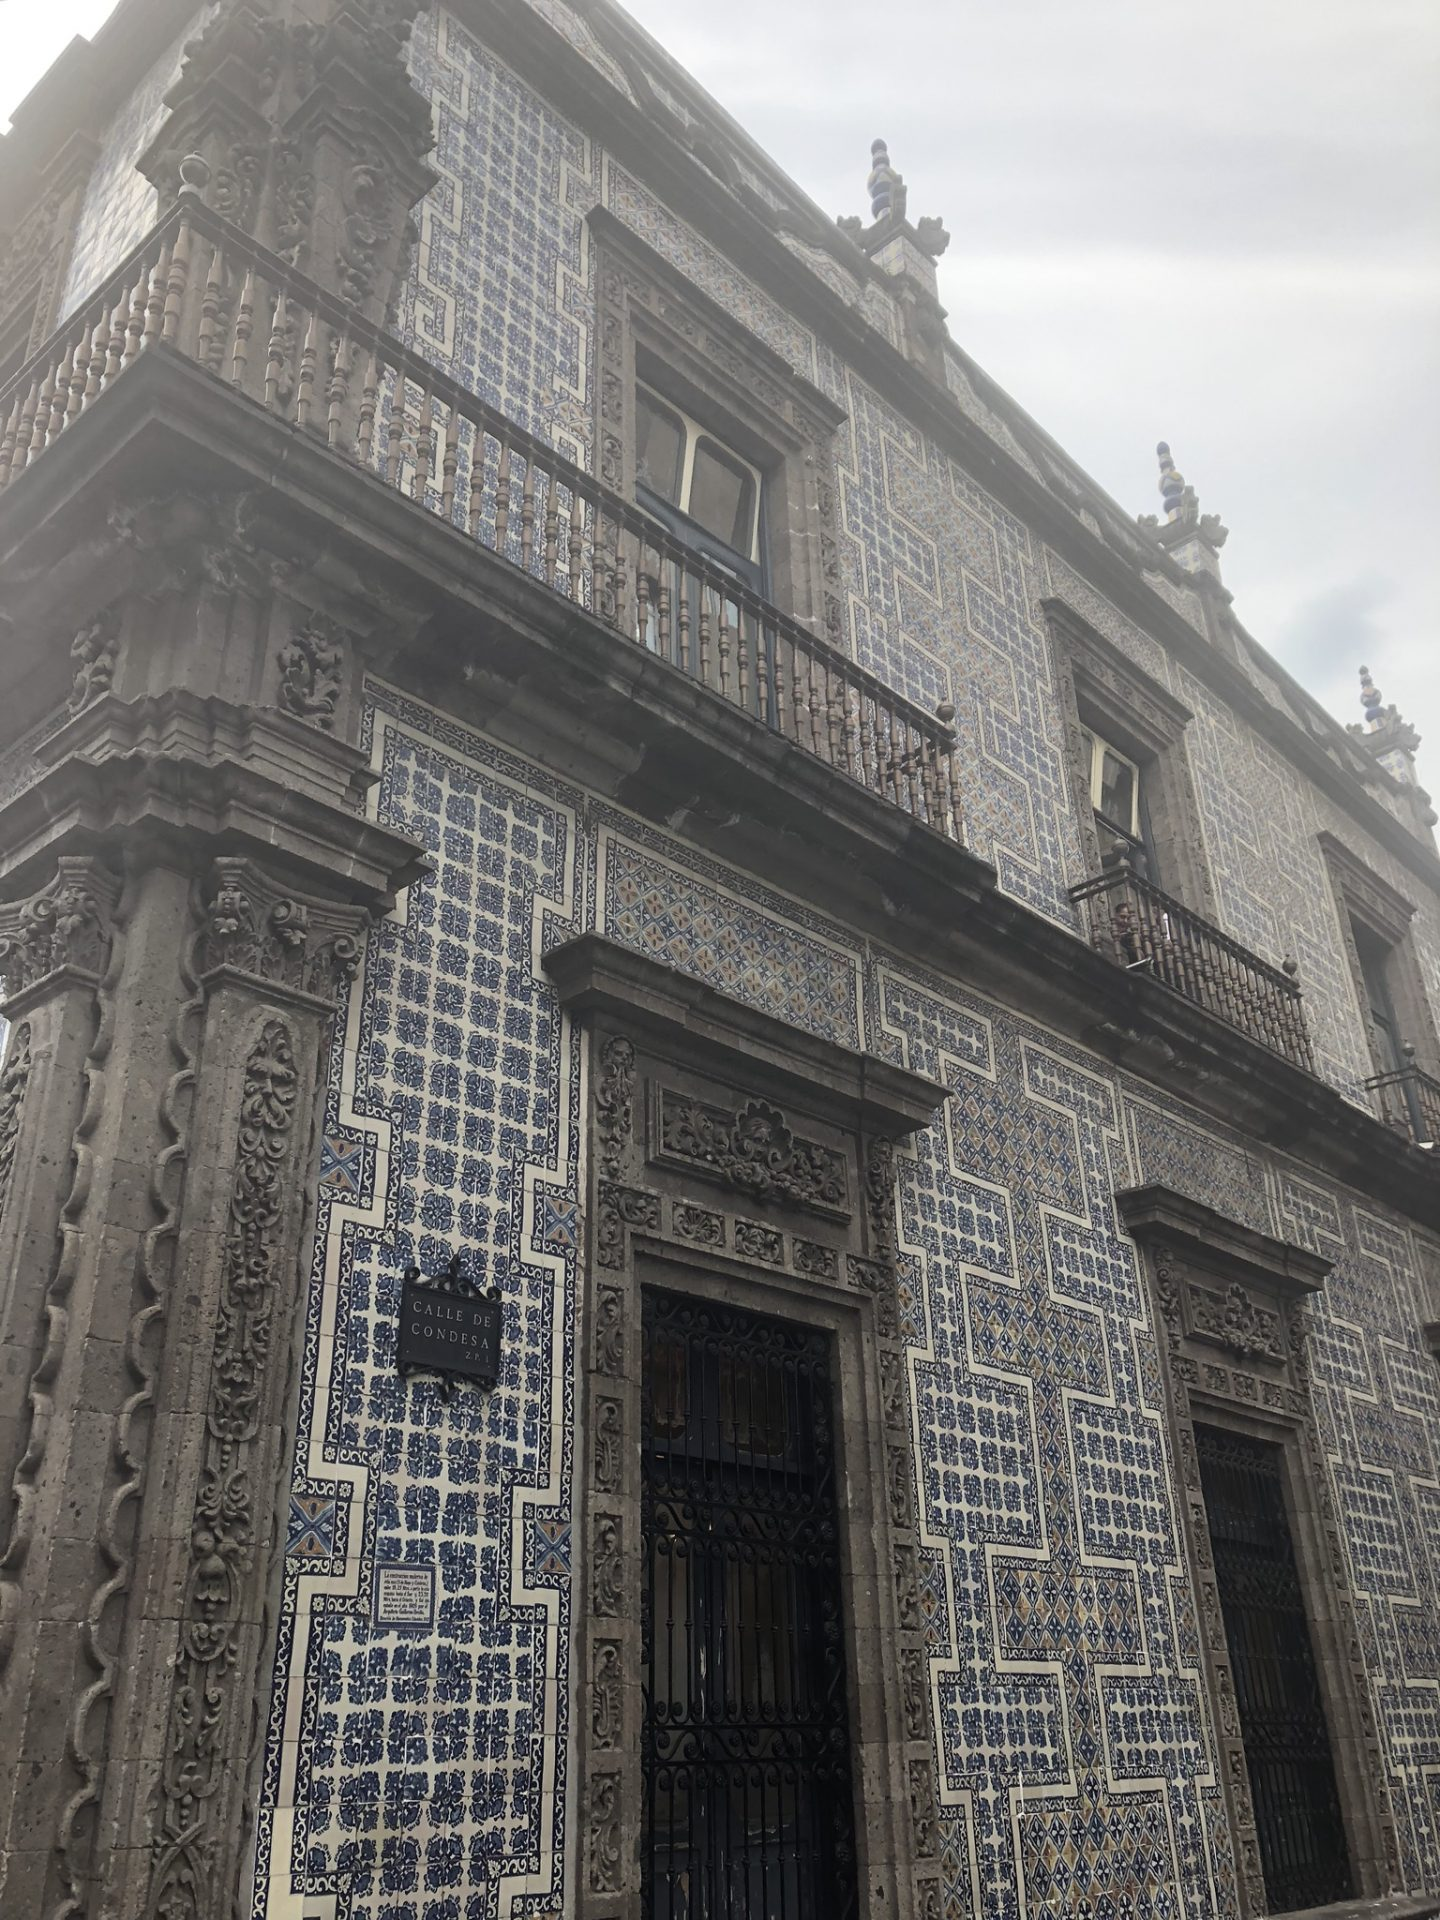 The House of Tiles, La Casa de Azulejos